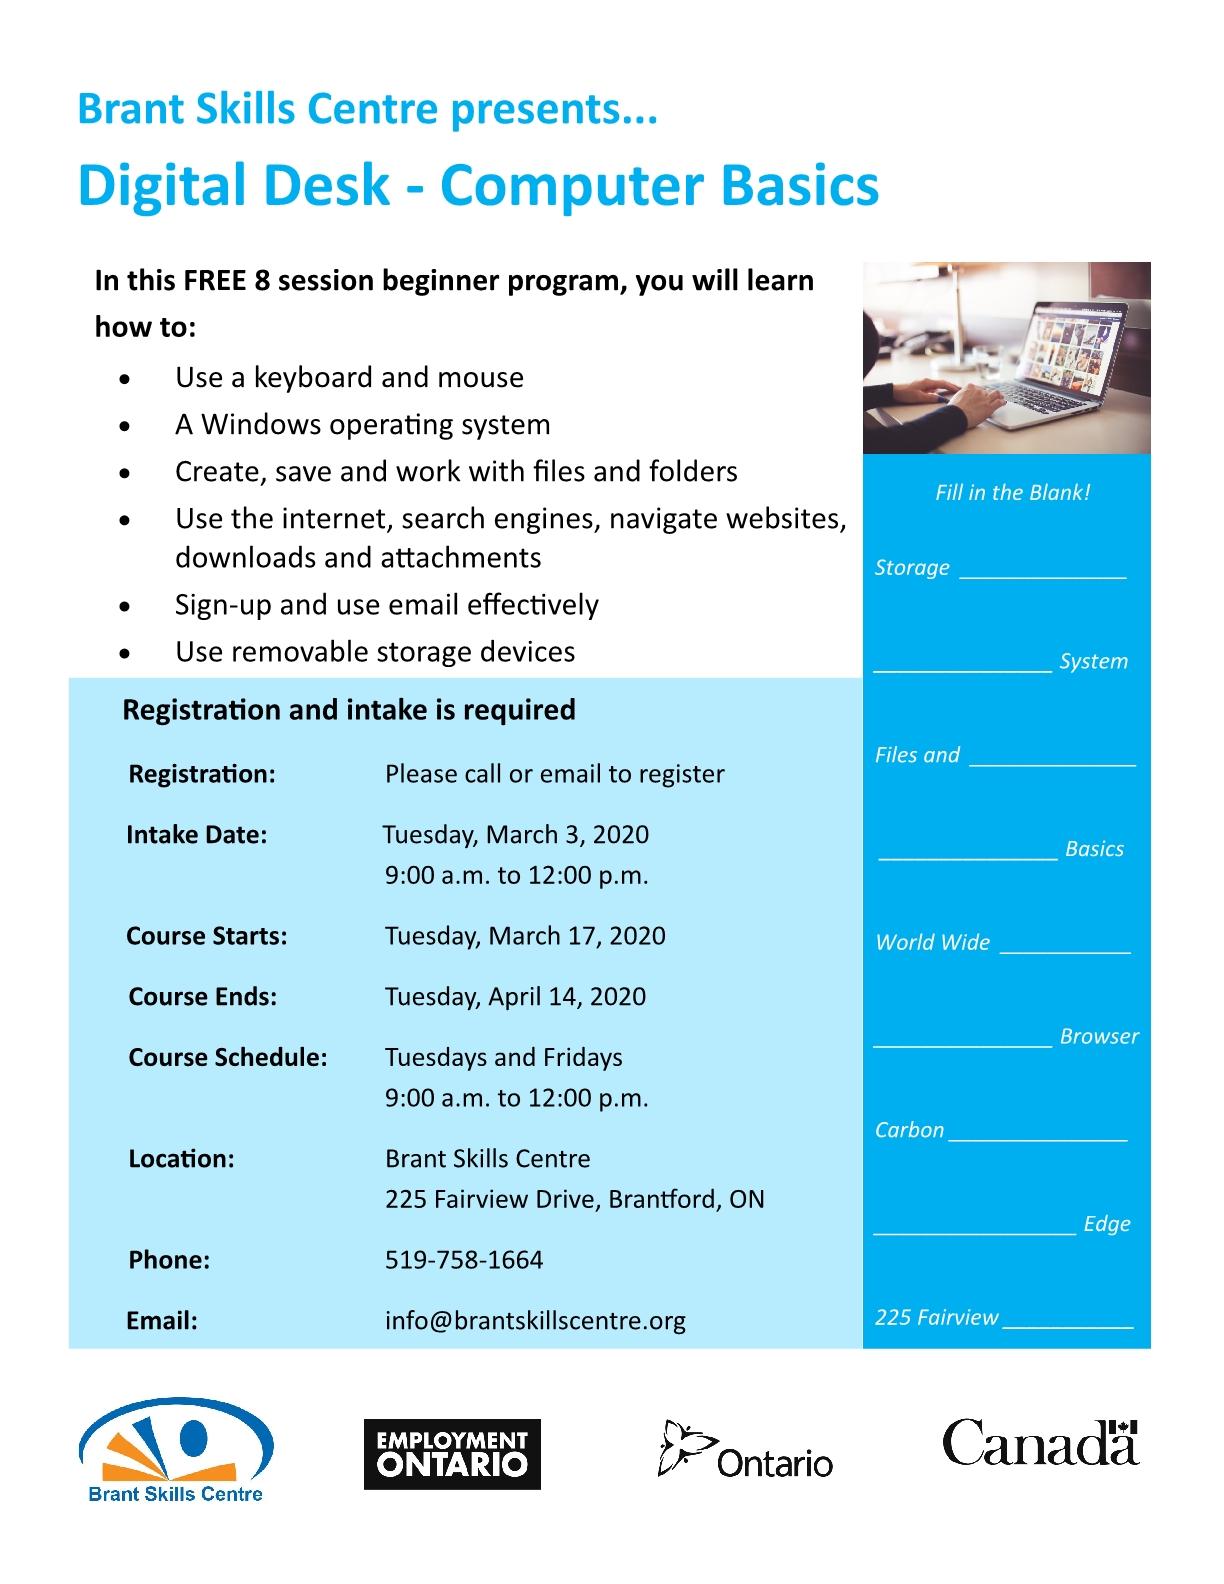 Digital Desk - Computeer Basics poster